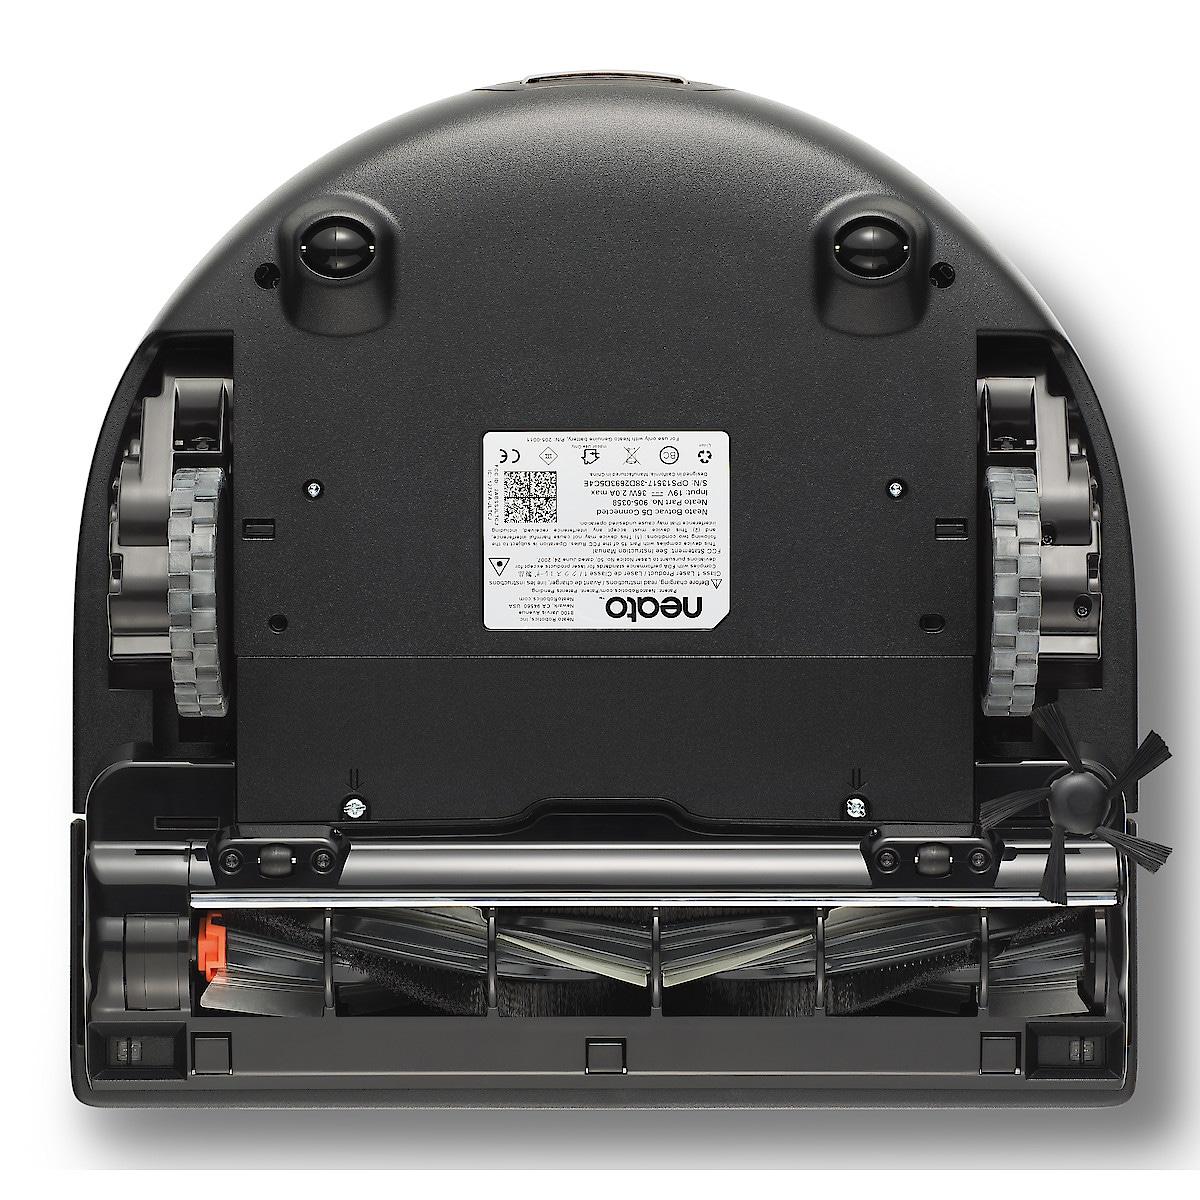 Neato Botvac D7 Connected robotstøvsuger